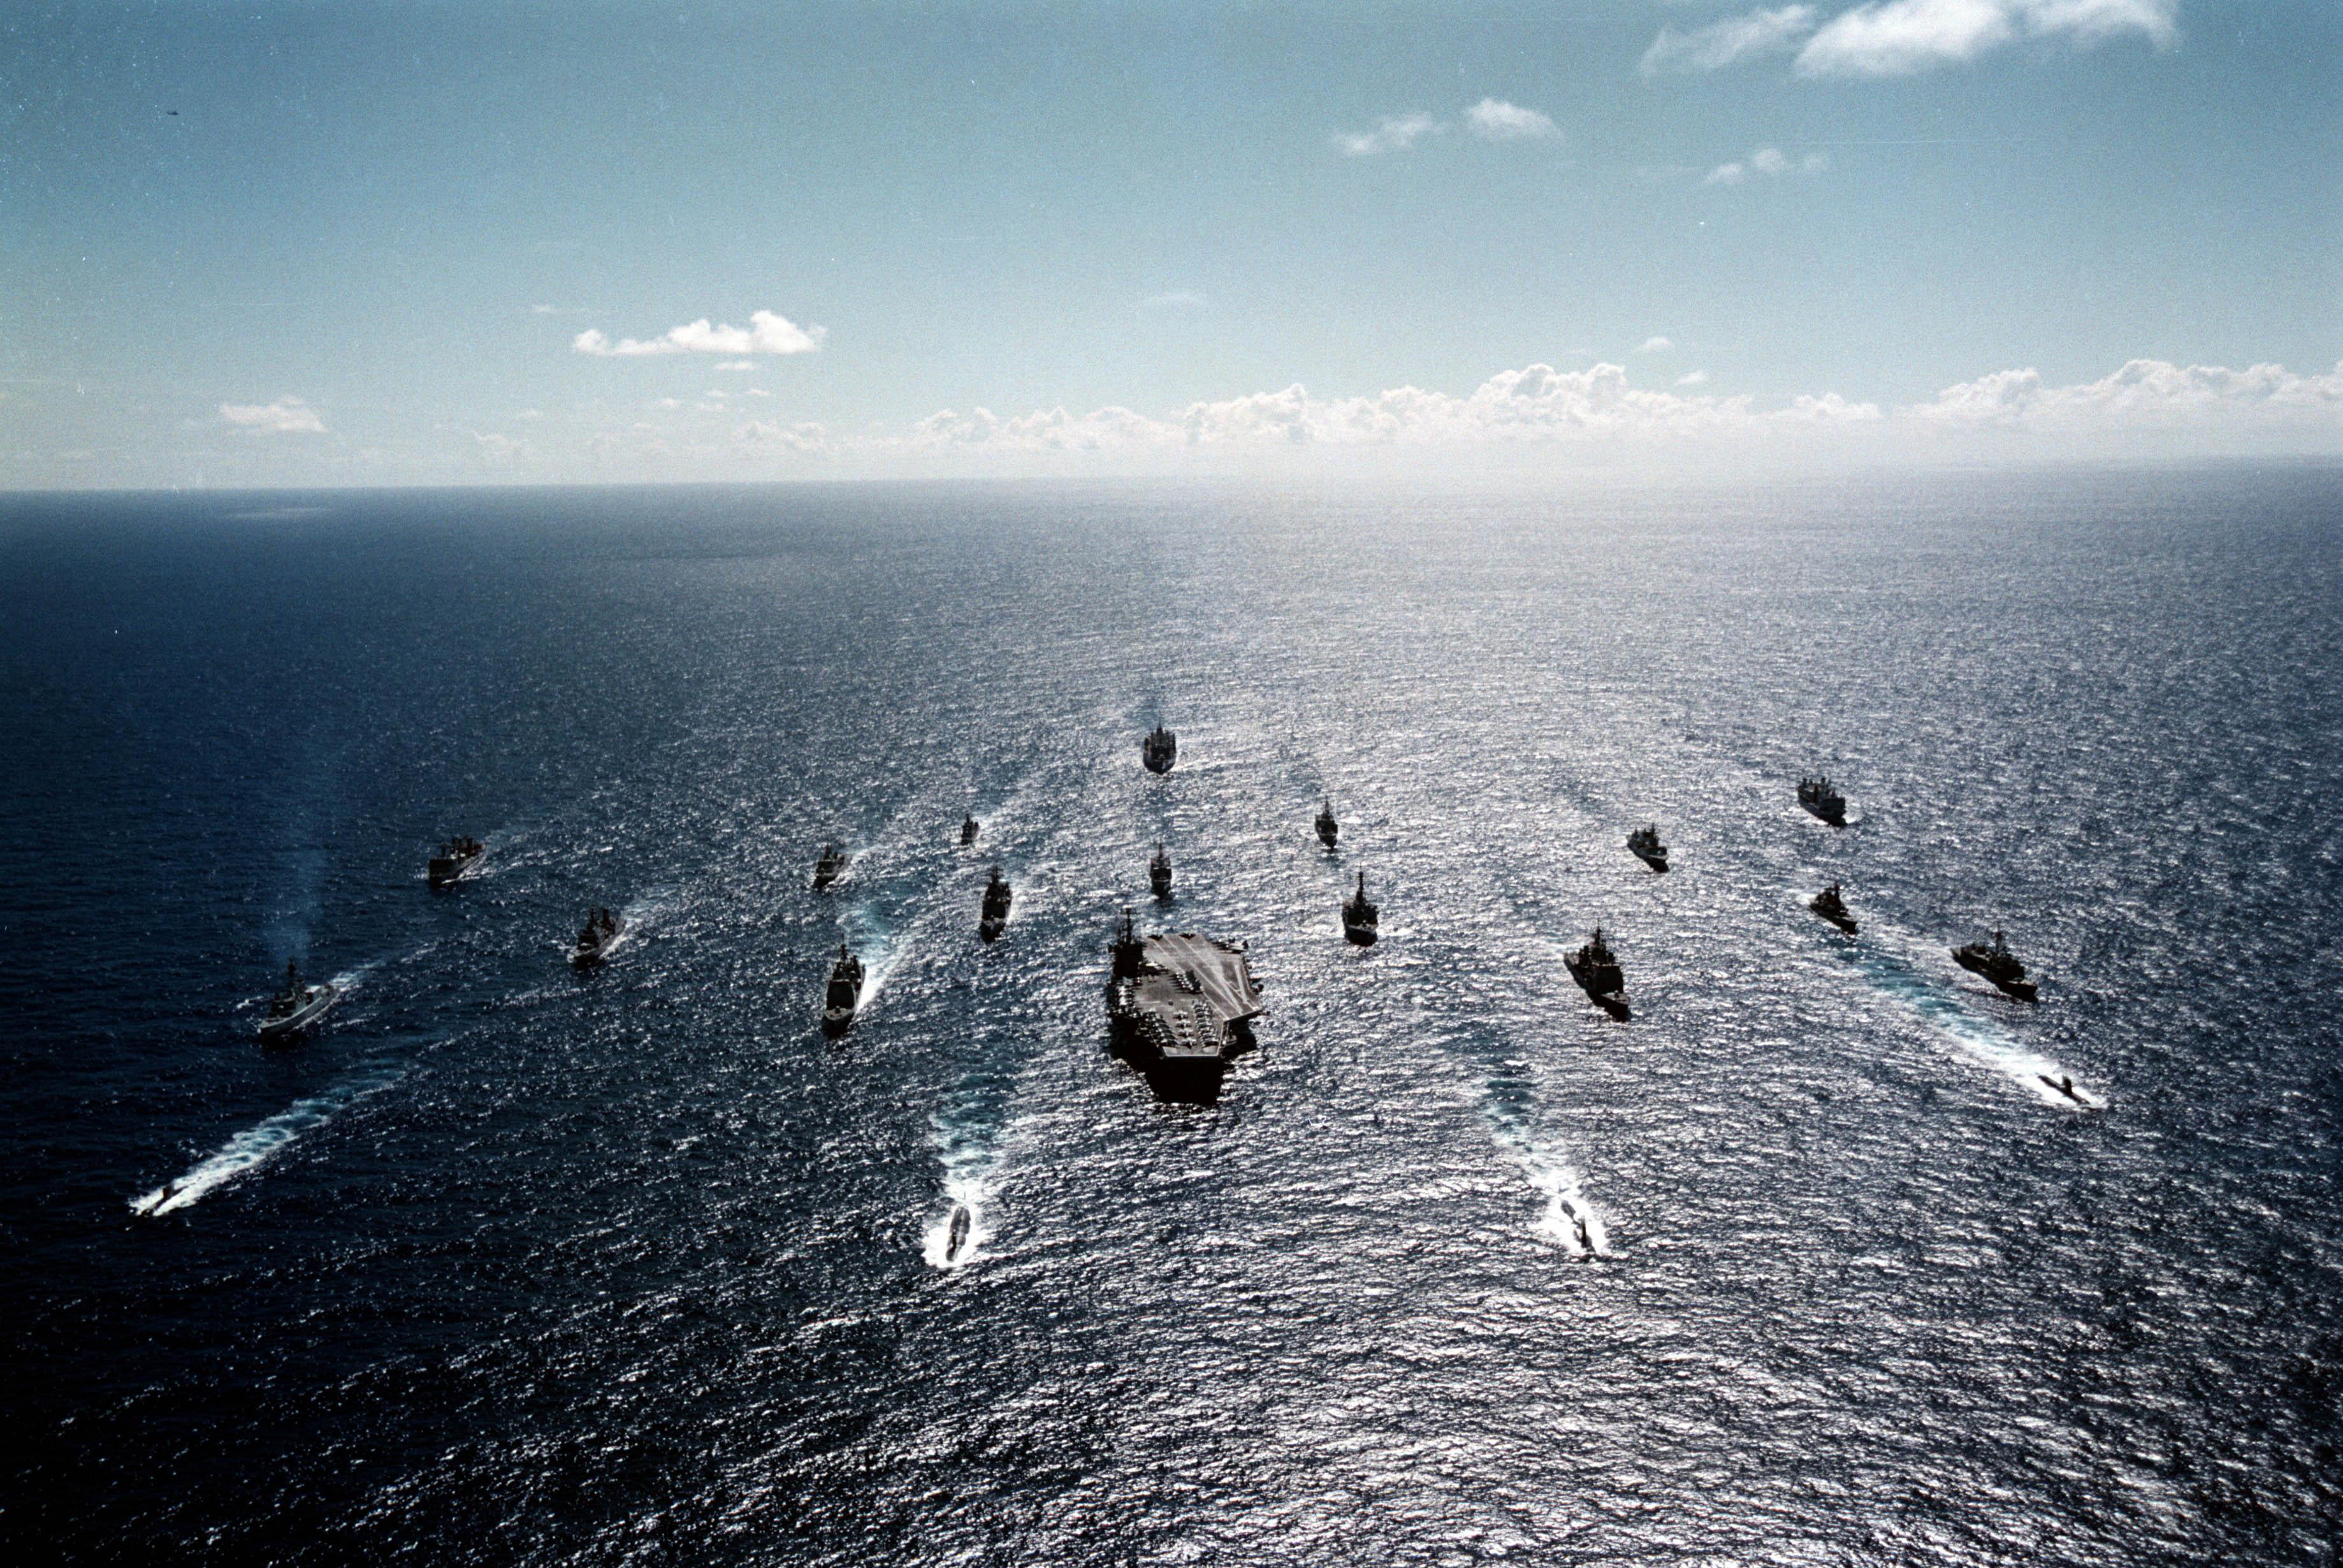 united states navy wallpapersjpg 3676x2460